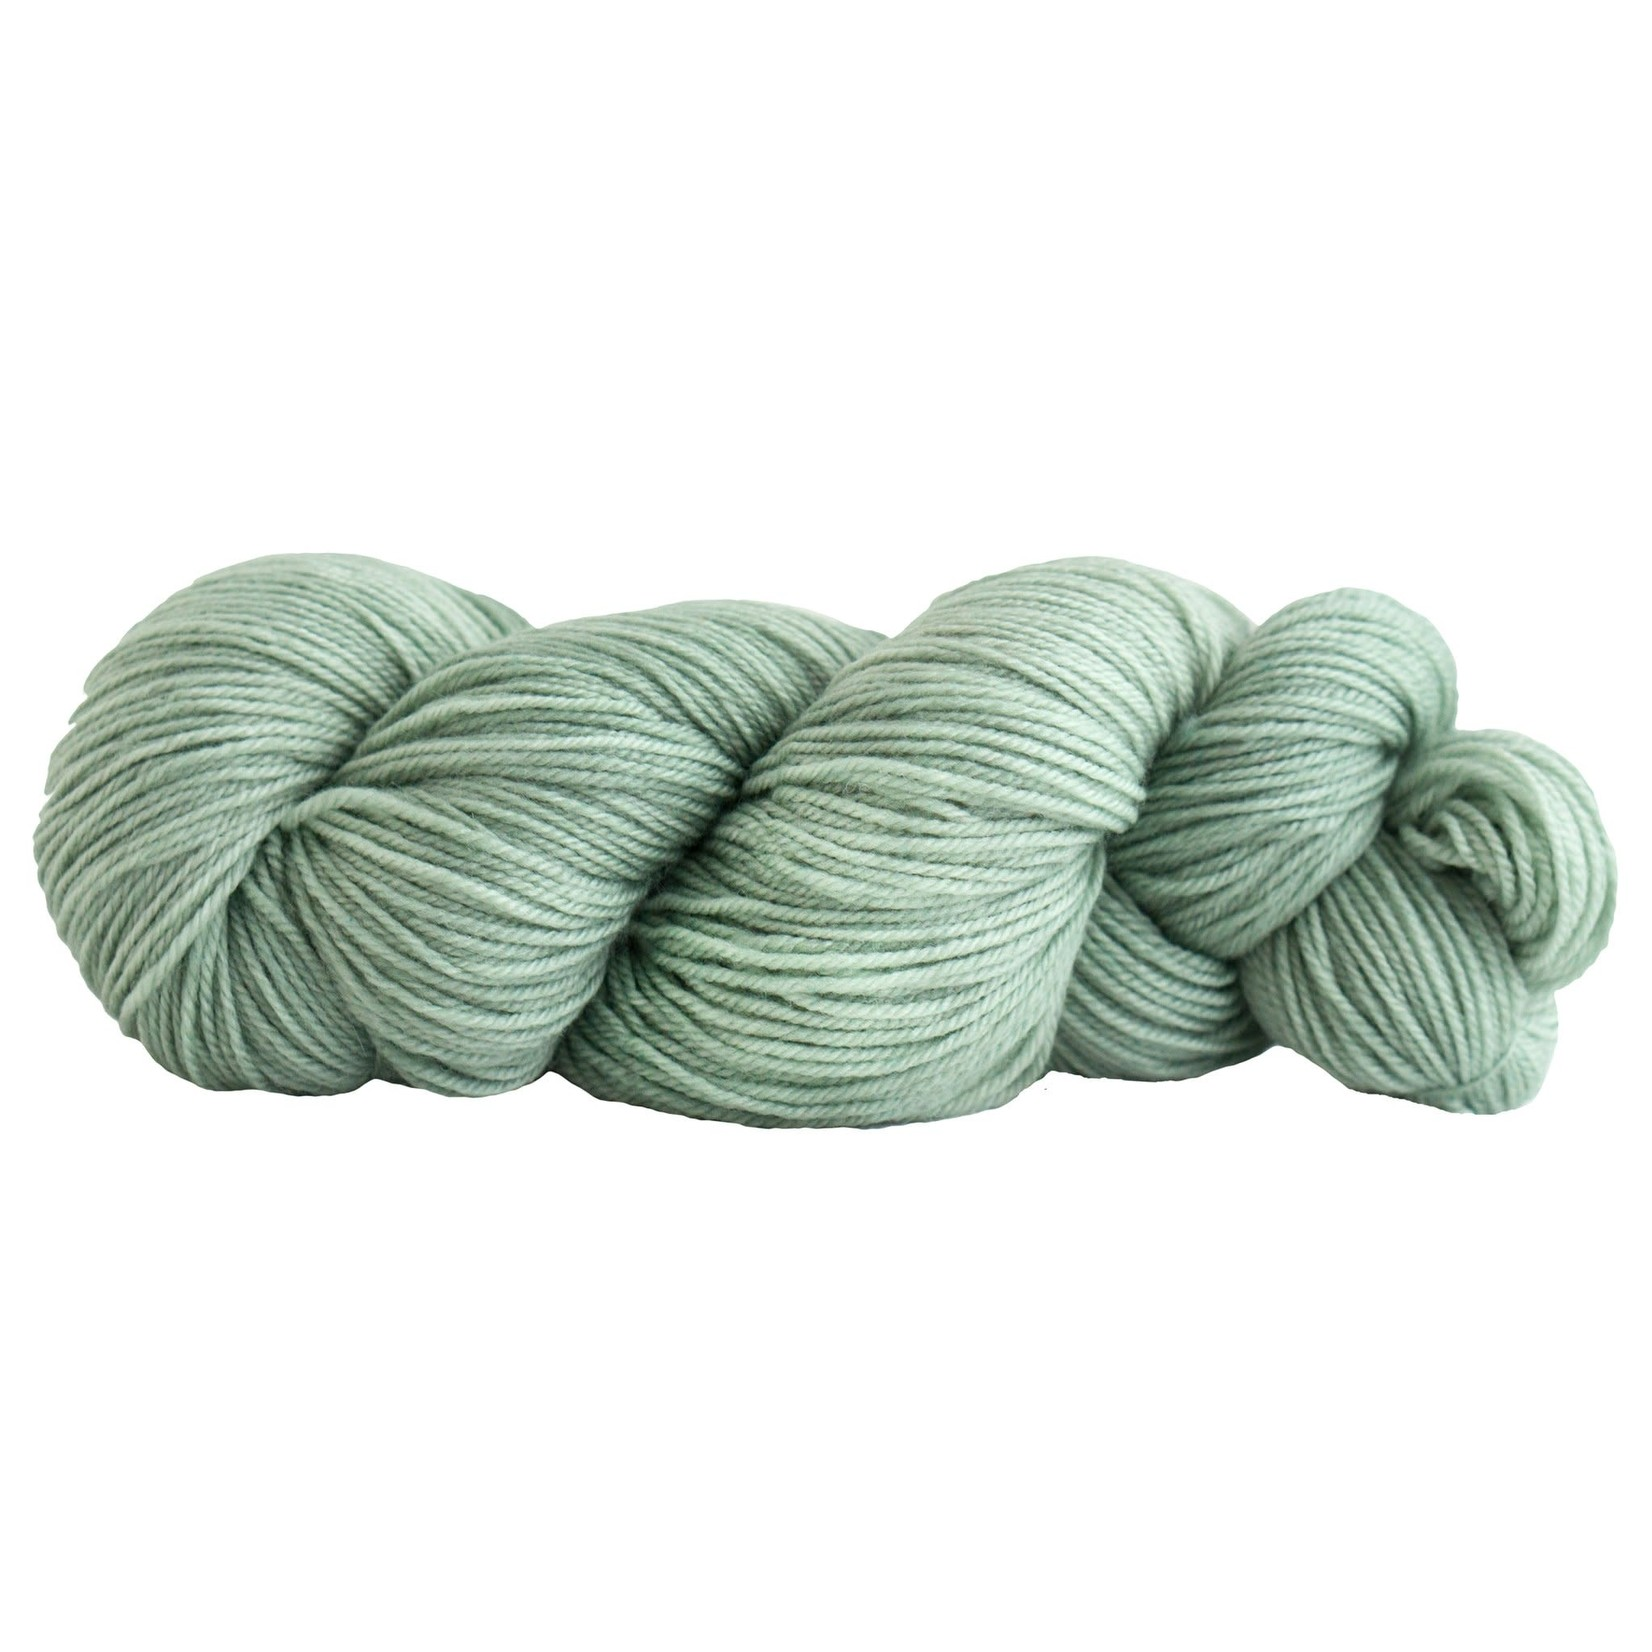 Fairmount Fibers Alegria, A2305, Celadon